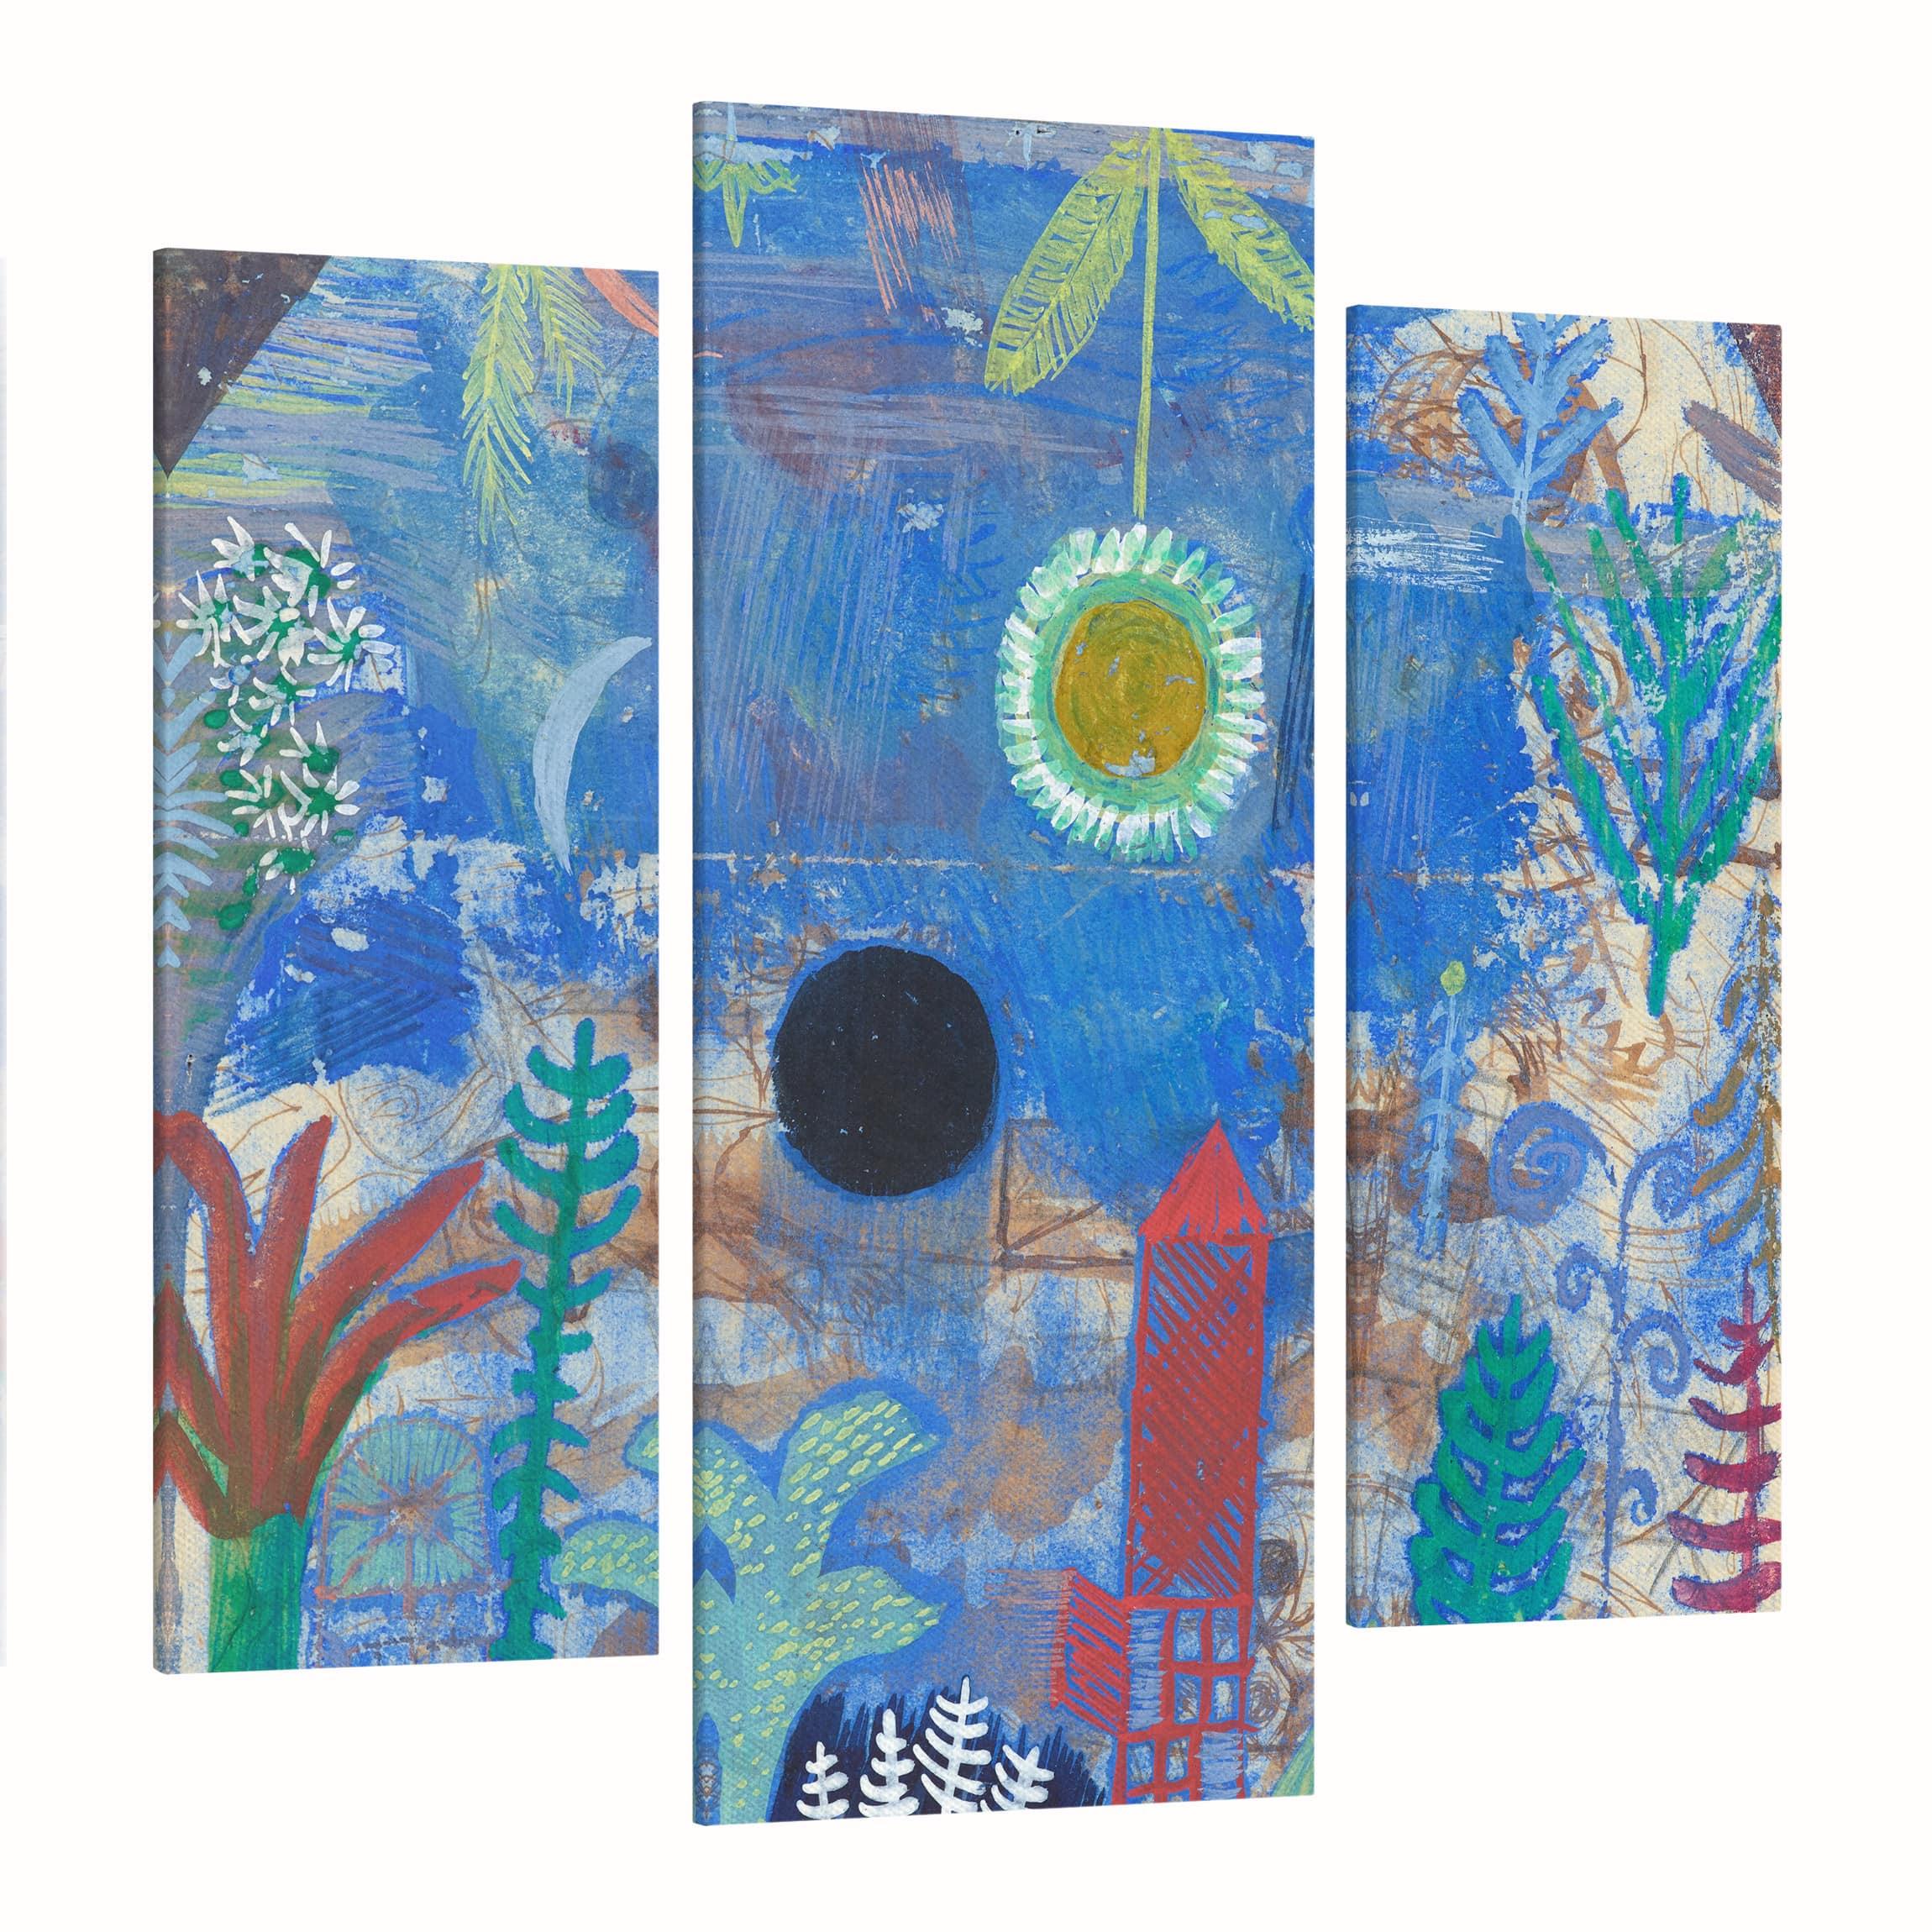 leinwandbild 3 teilig paul klee versunkene landschaft galerie triptychon. Black Bedroom Furniture Sets. Home Design Ideas